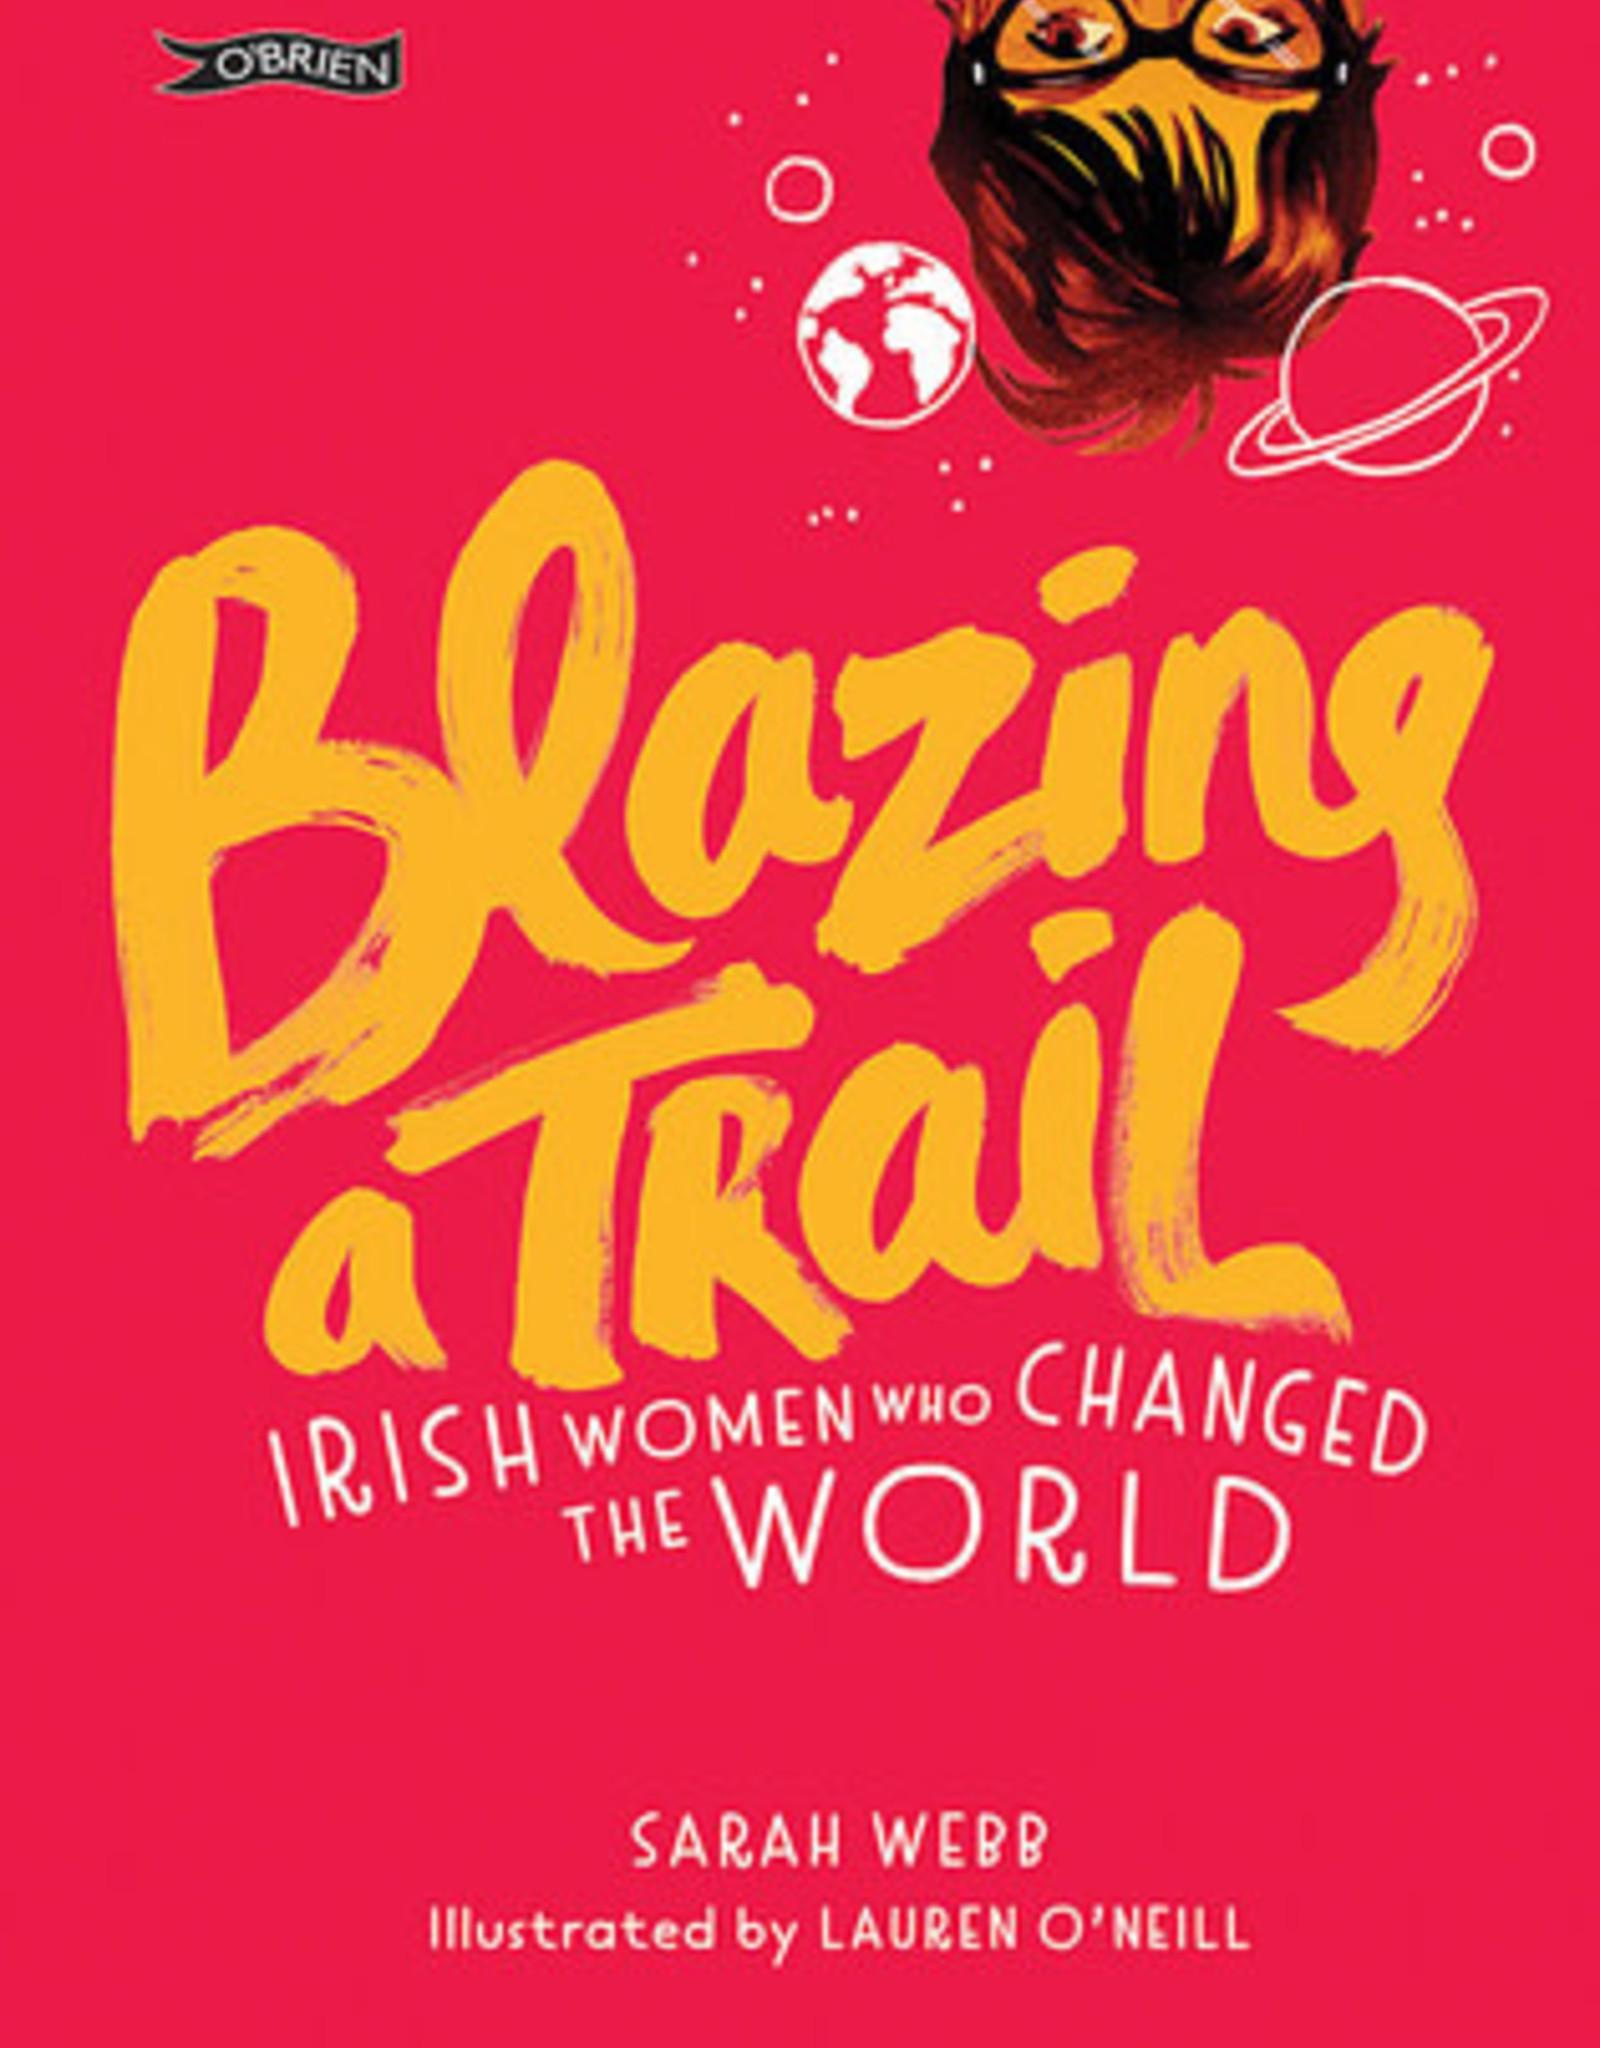 Blazing A Trail: Irish Women Who Changed The World - Sarah Webb